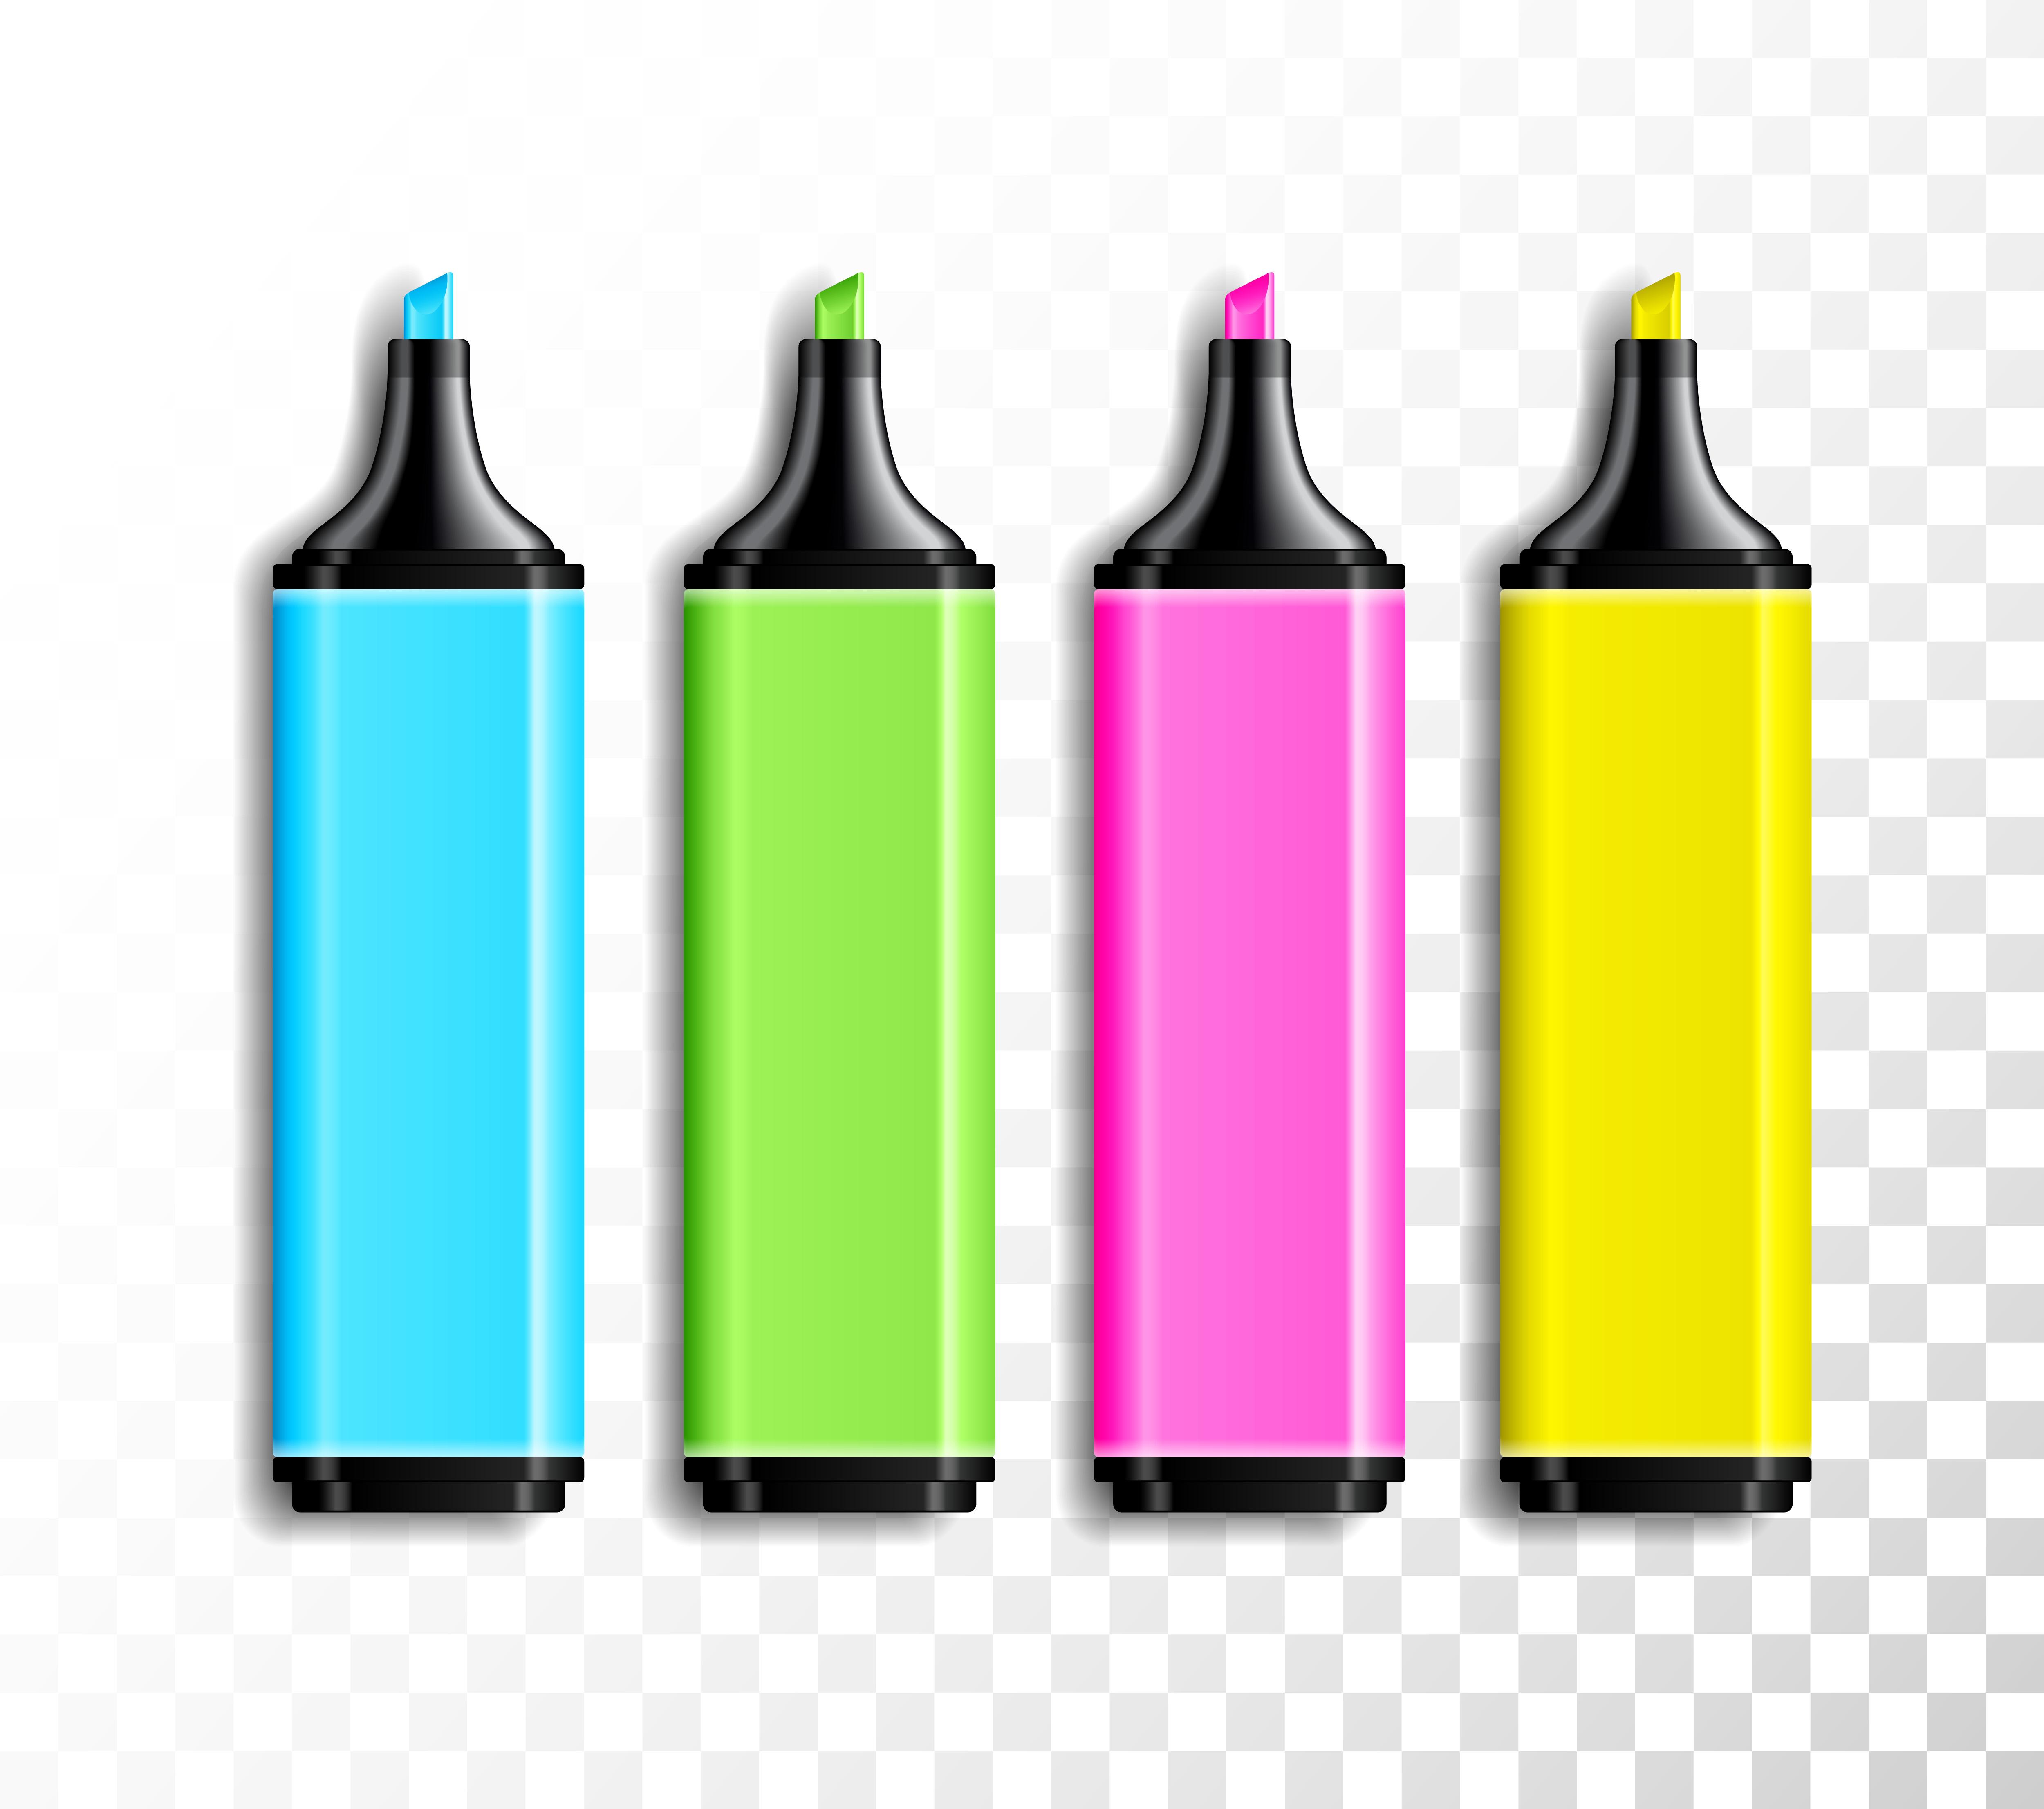 Design Set Of Colored Highlighter Pens 336571